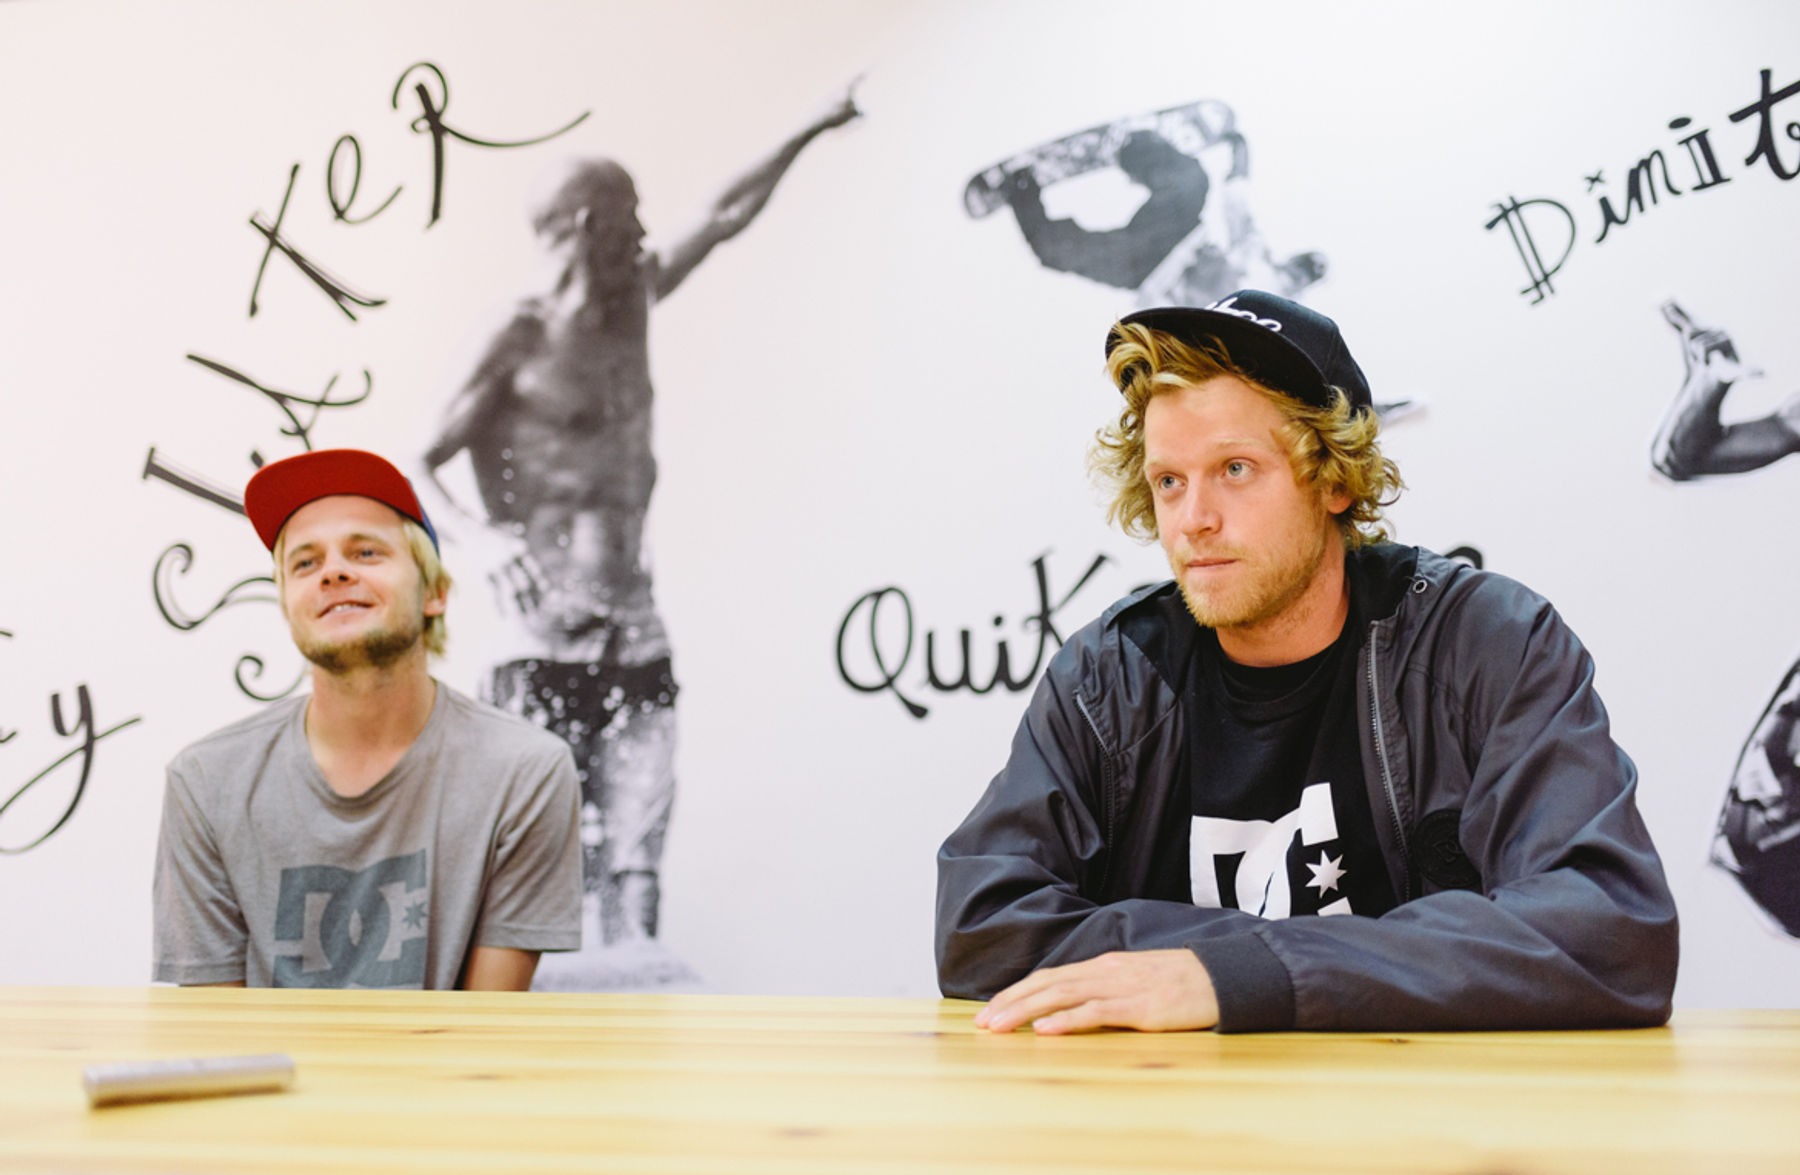 _IHC3374e-Wes-Kremer-Madars-Apse-DC-Special-Delivery-Skate-Tour-BTS-Interviews-London-May-2015-Photographer-Maksim-Kalanep